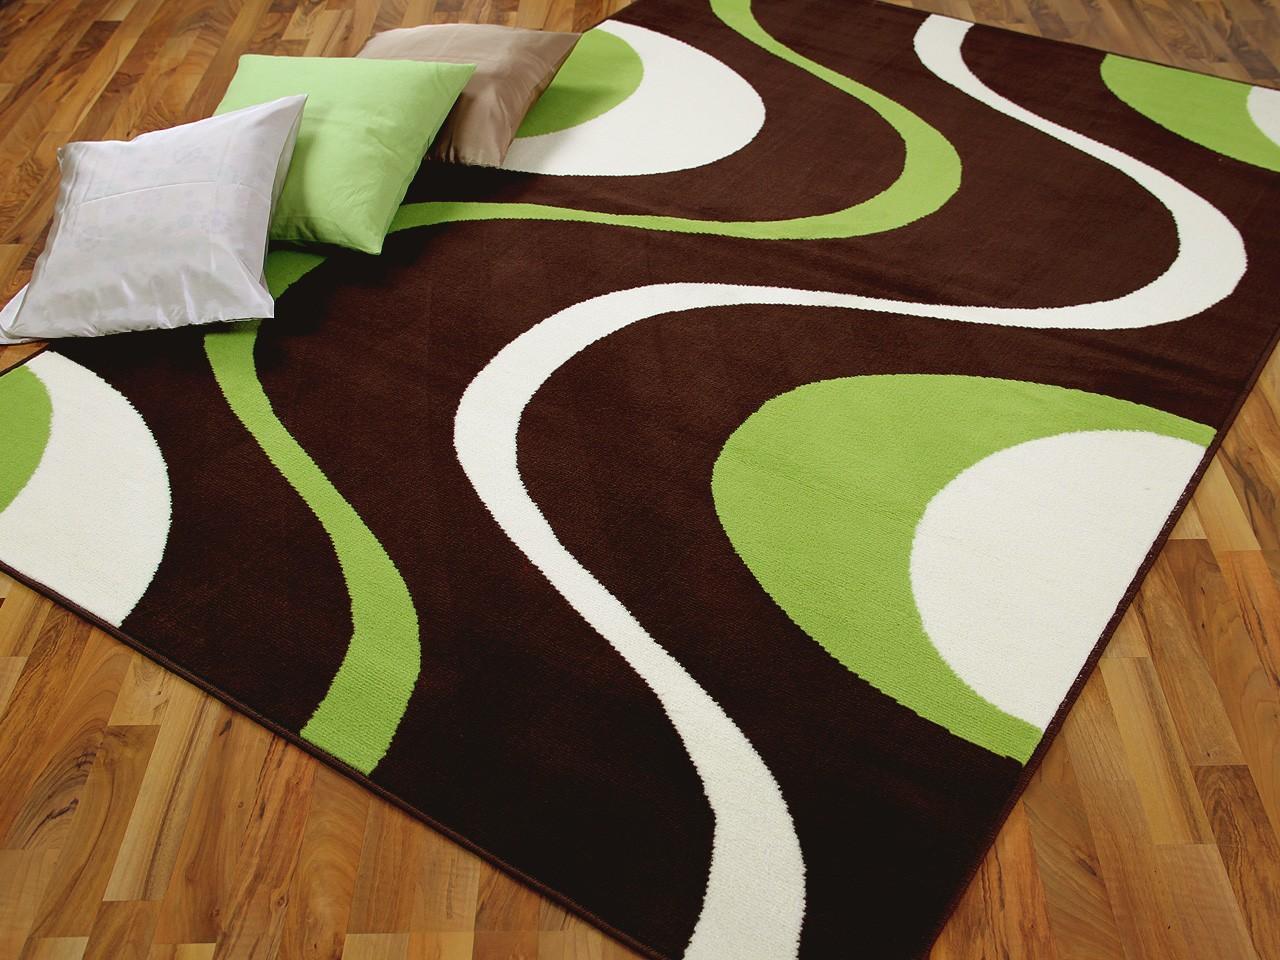 teppich modern trendline braun gr n retro 4 gr en. Black Bedroom Furniture Sets. Home Design Ideas